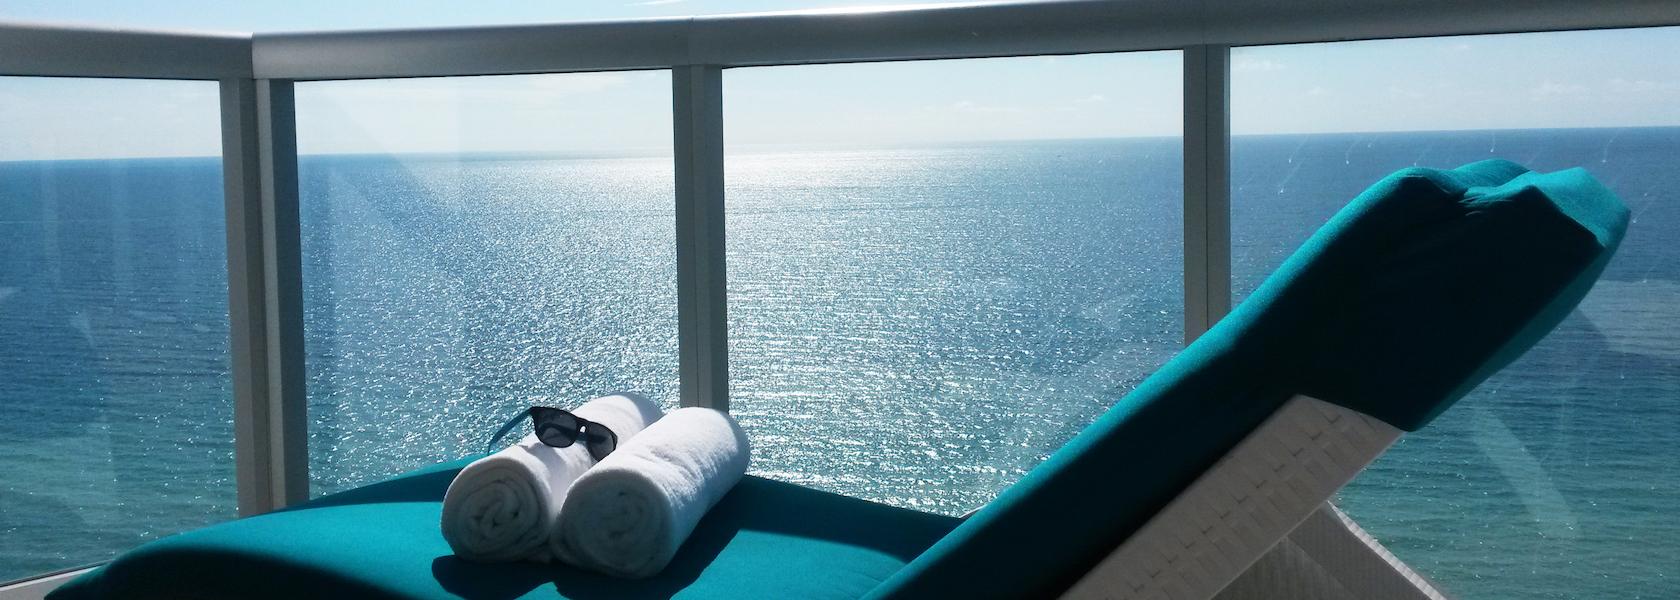 Lounge chair on balcony overlooking ocean at Marenas Beach Resort